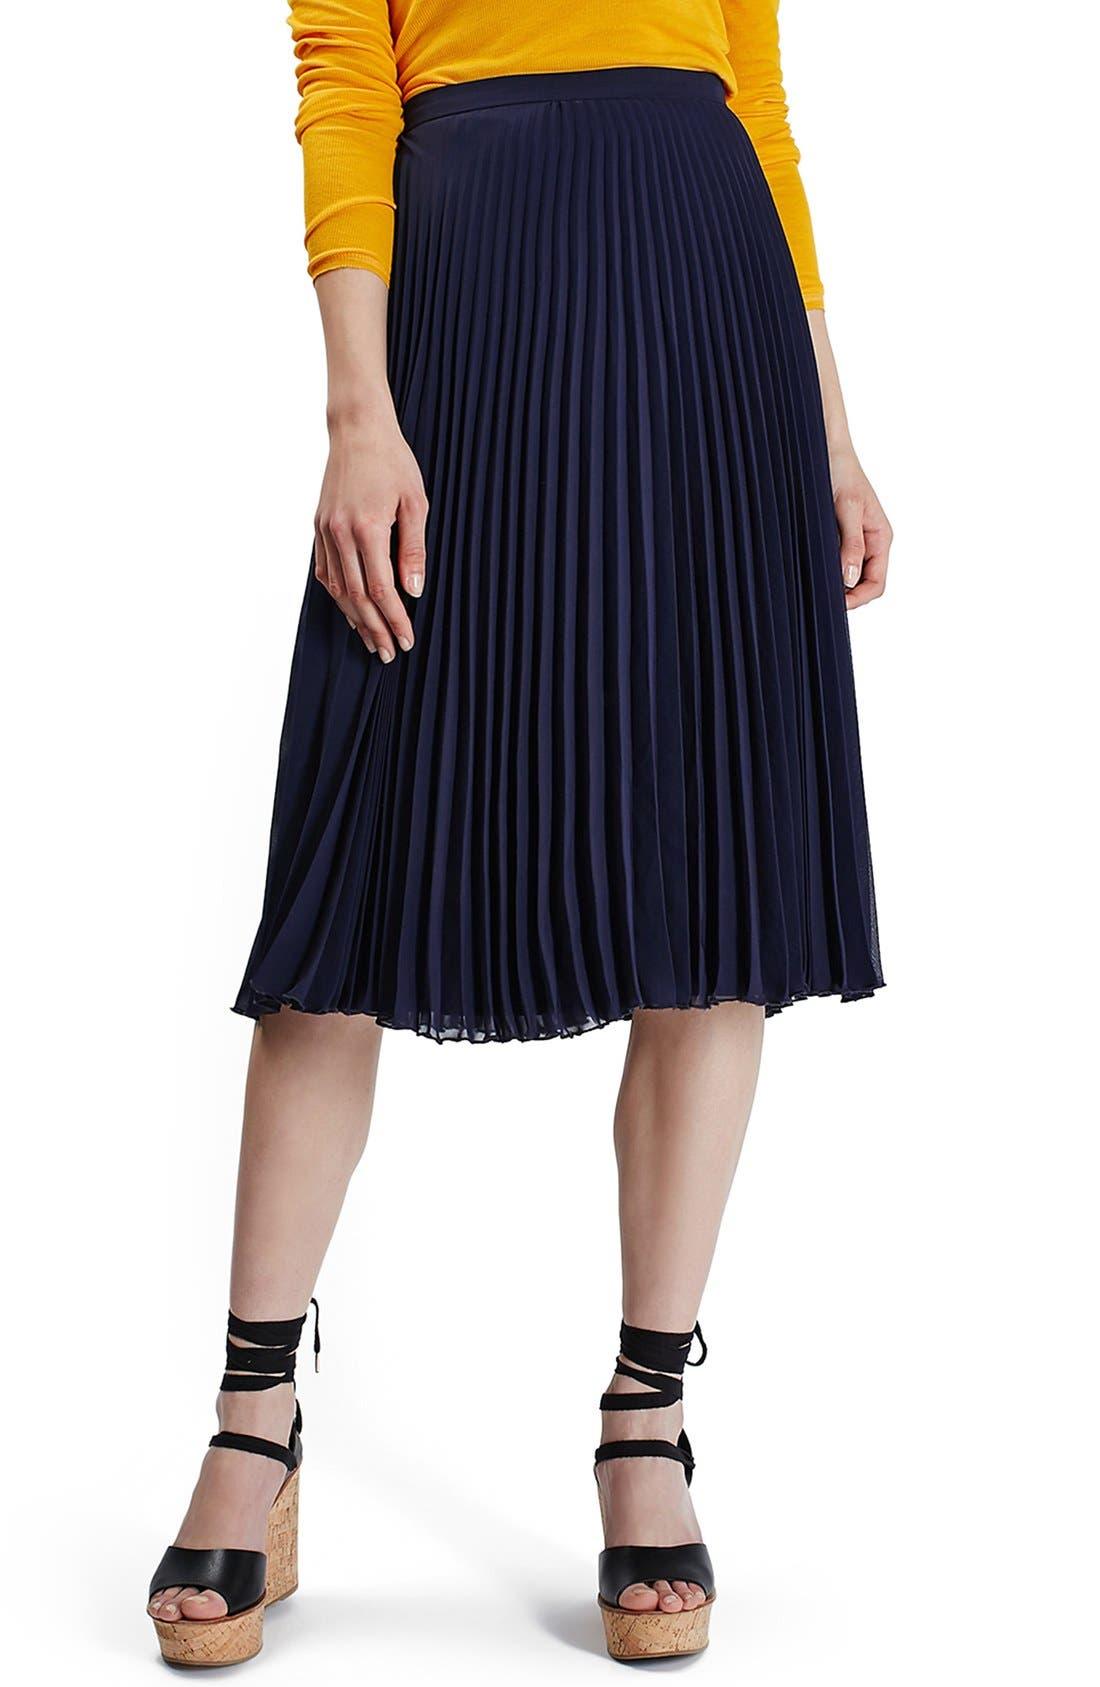 Topshop Chiffon Pleated Midi Skirt | Nordstrom